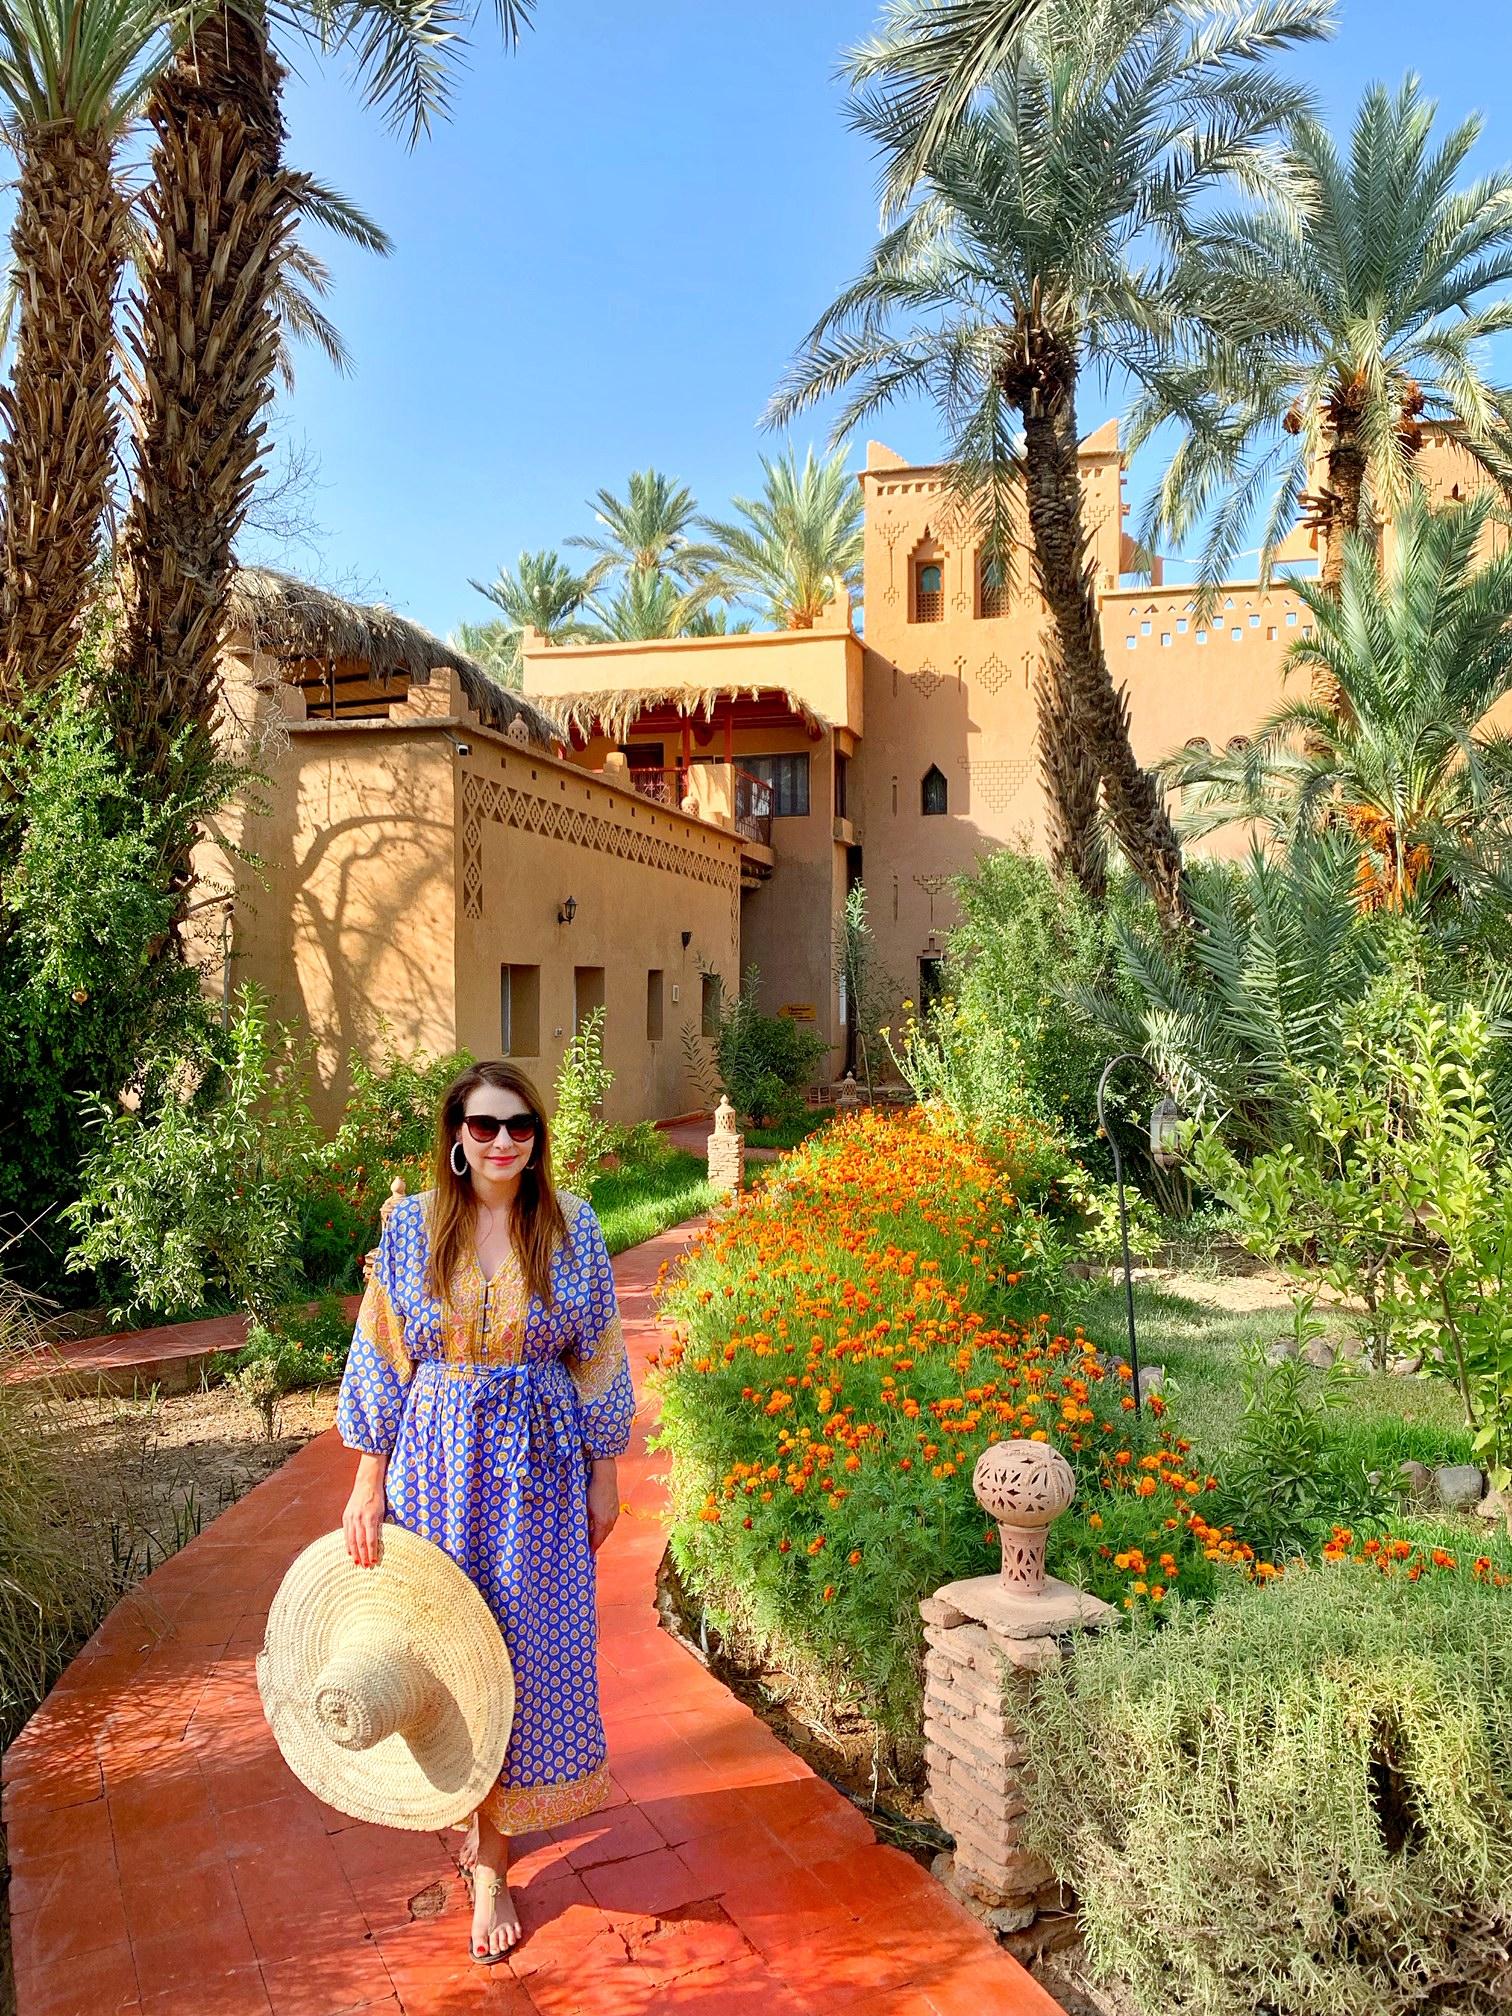 kasbah azul, morocco, the-alyst.com